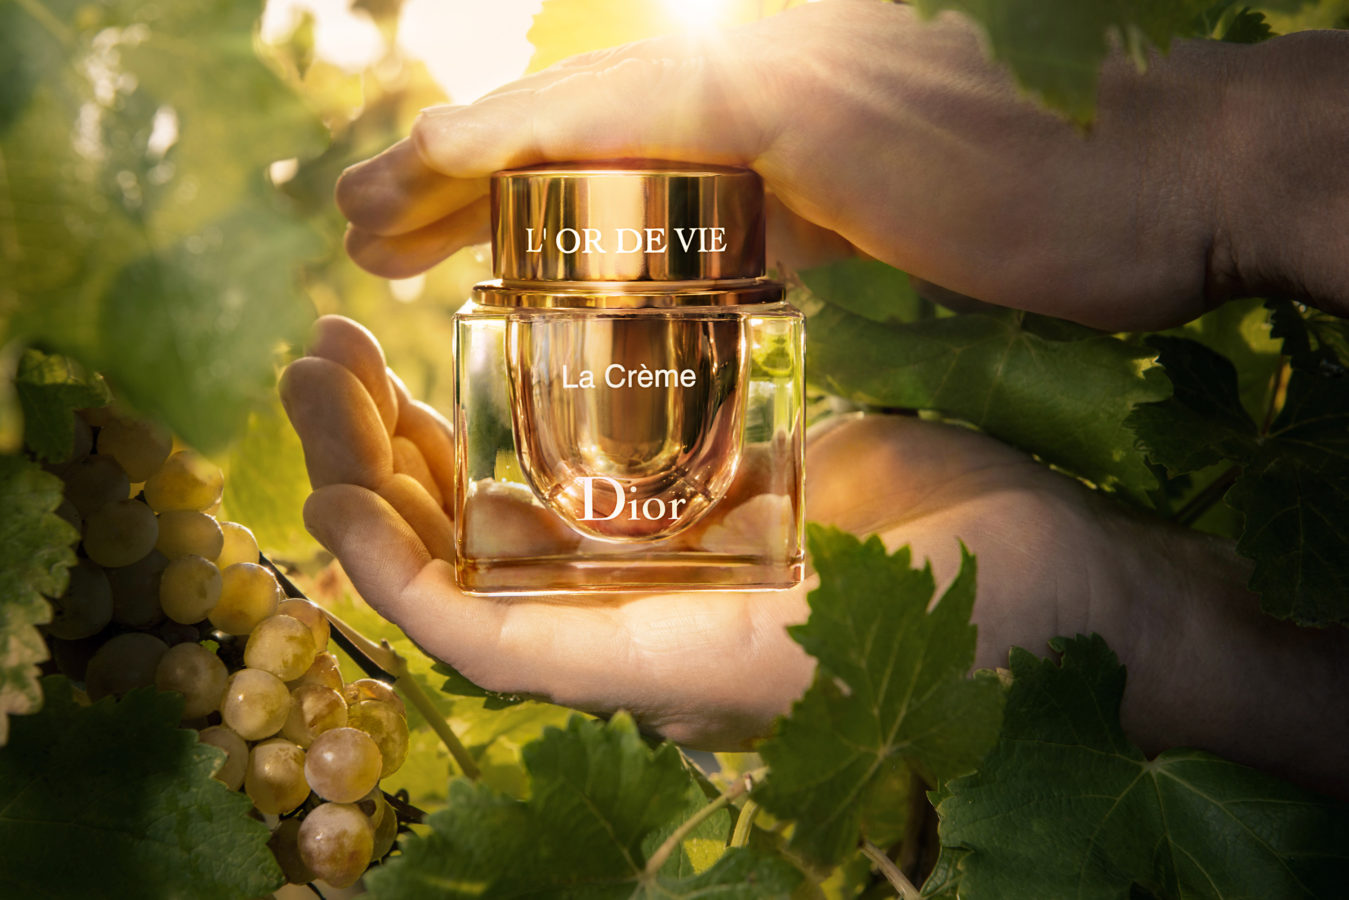 L'Or de Vie: Dior further elevates its revolutionary anti-aging formula